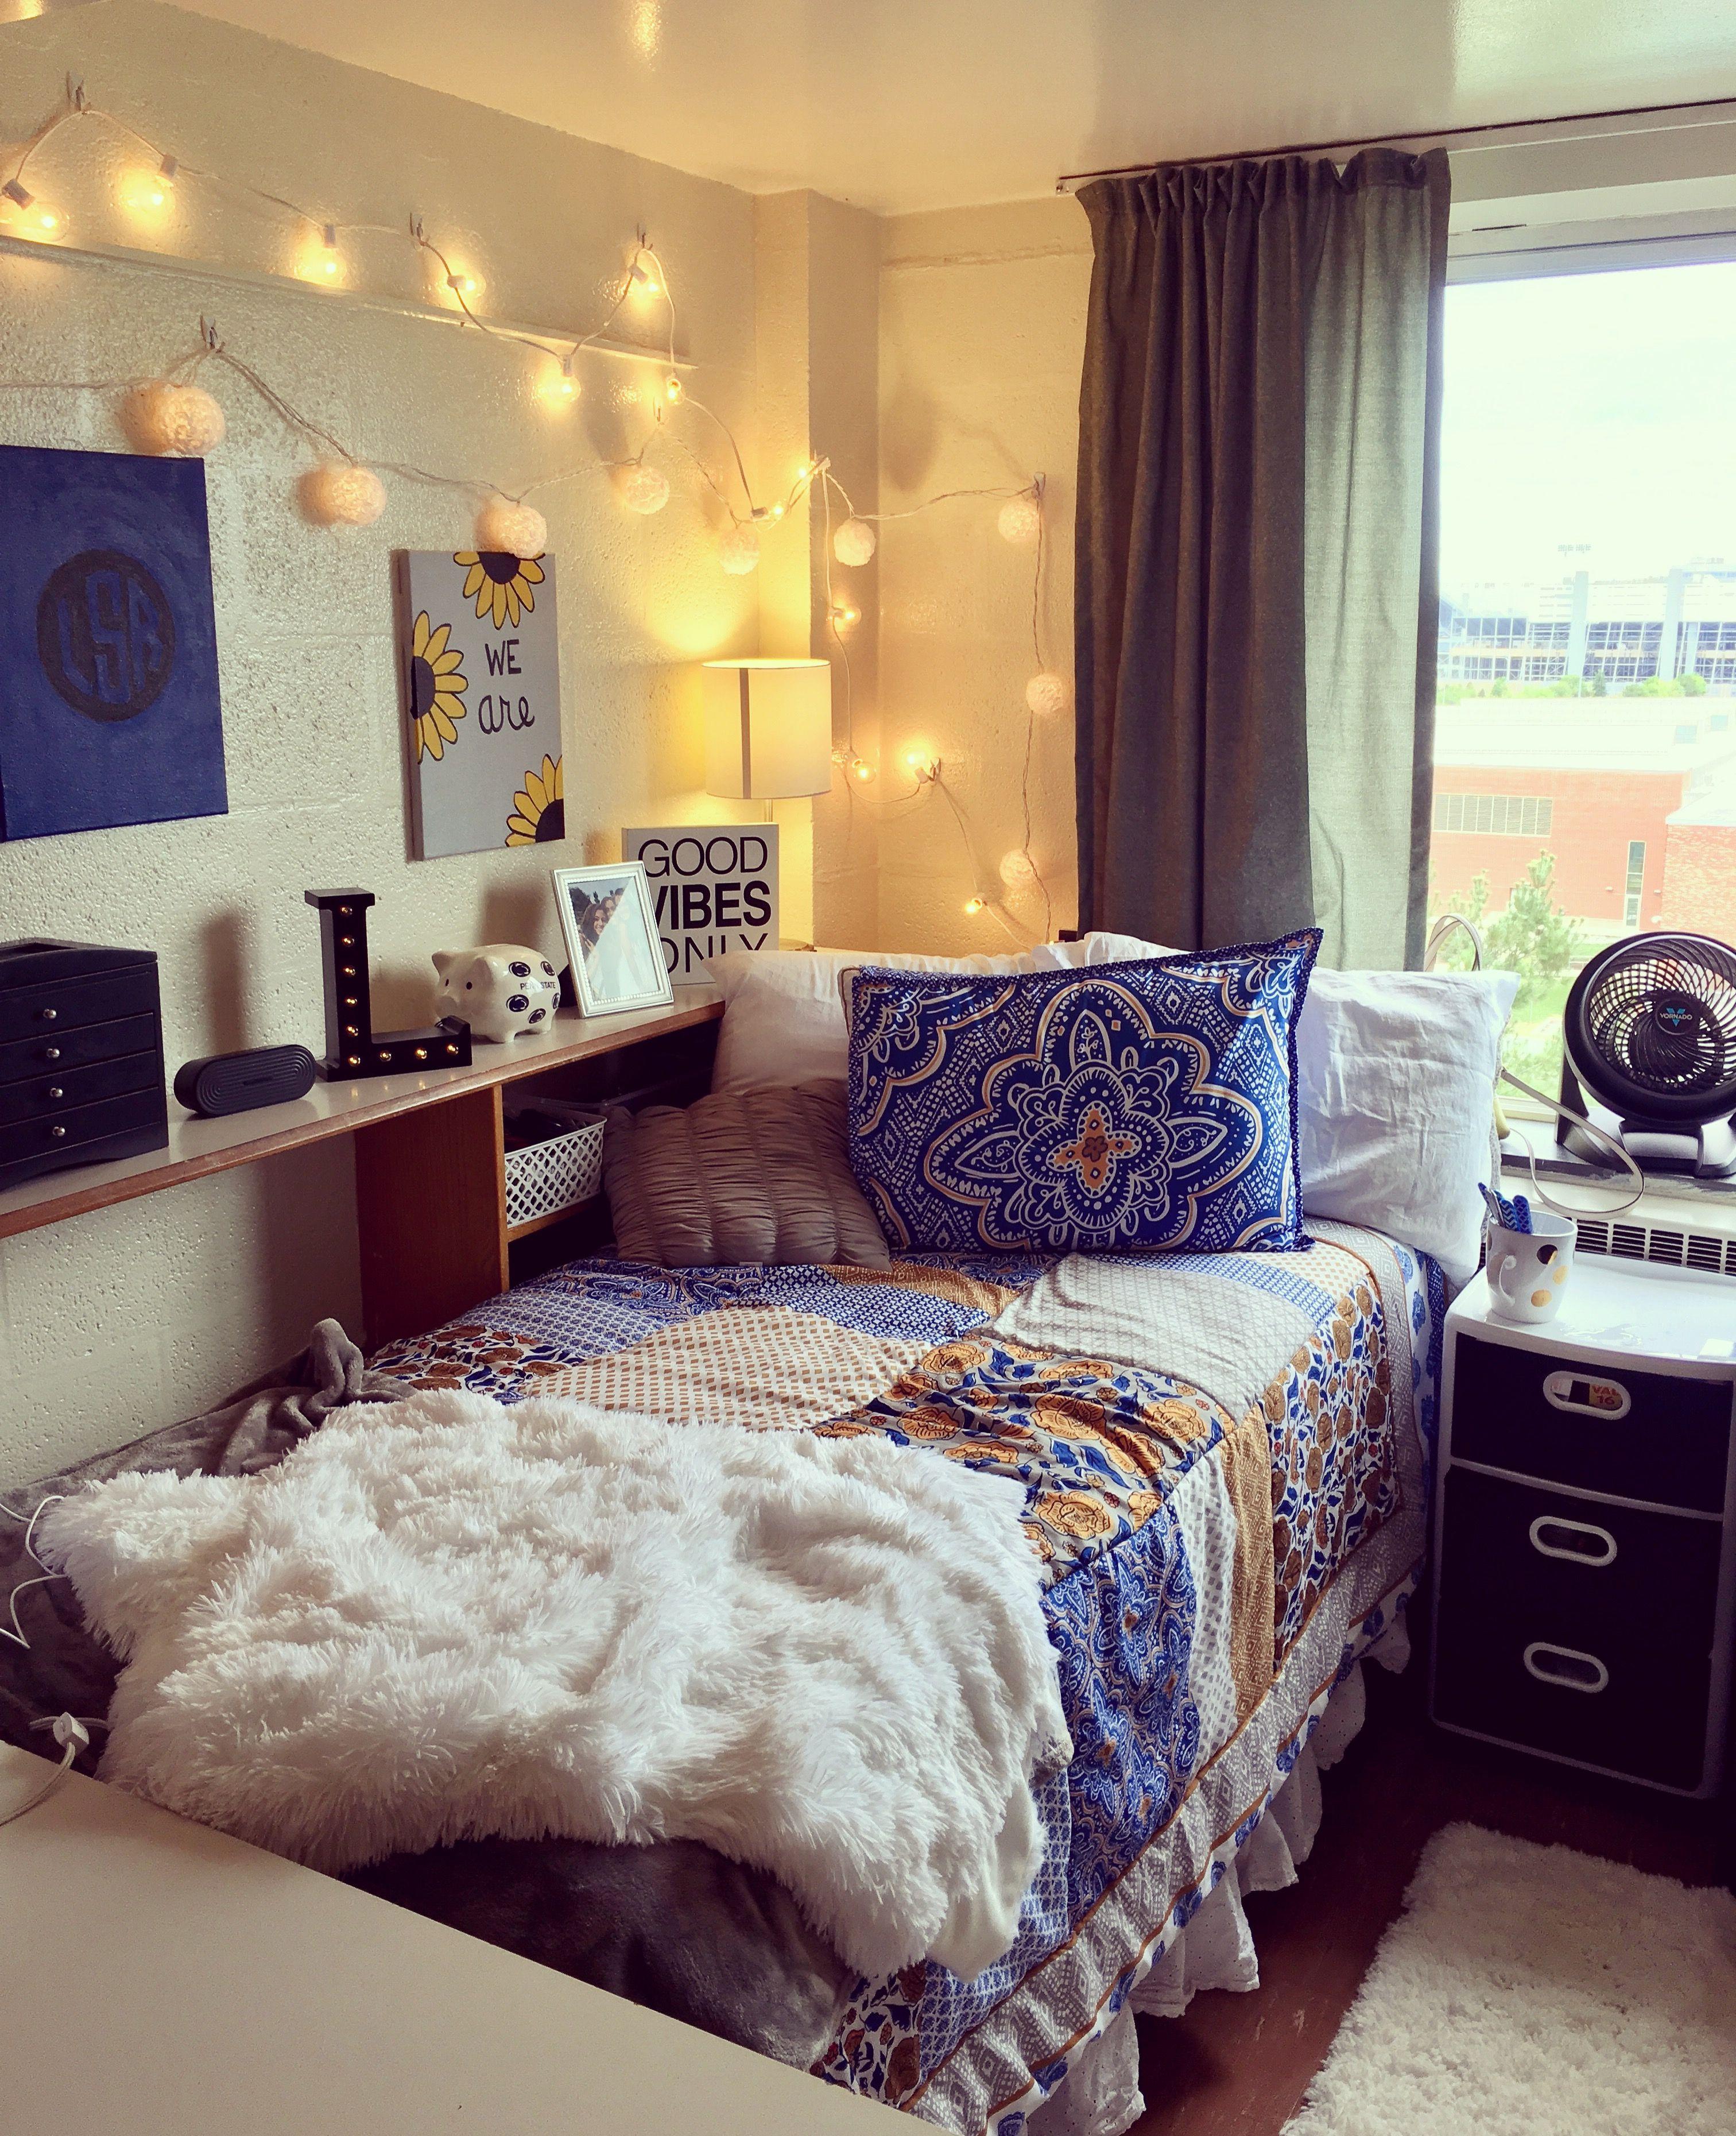 Penn State East Halls | college dorm | Pinterest